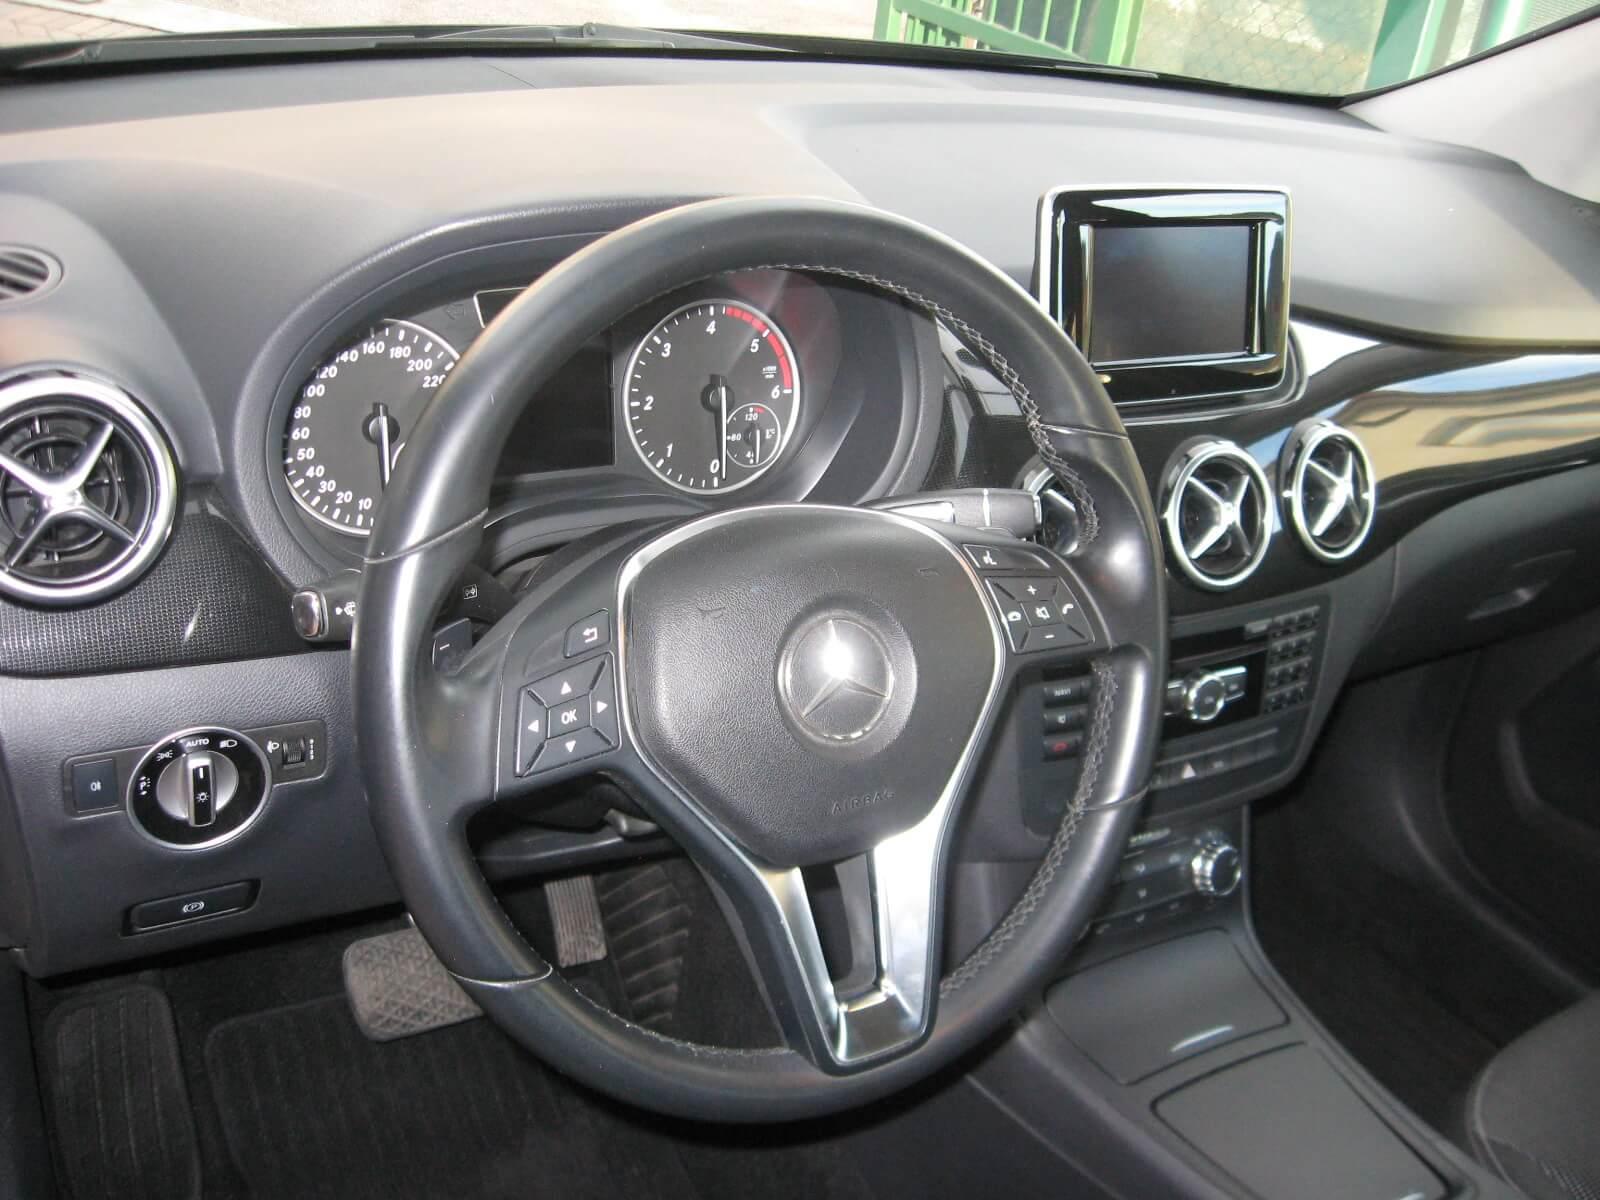 Mercedes-Benz B 180 CDI Automatic